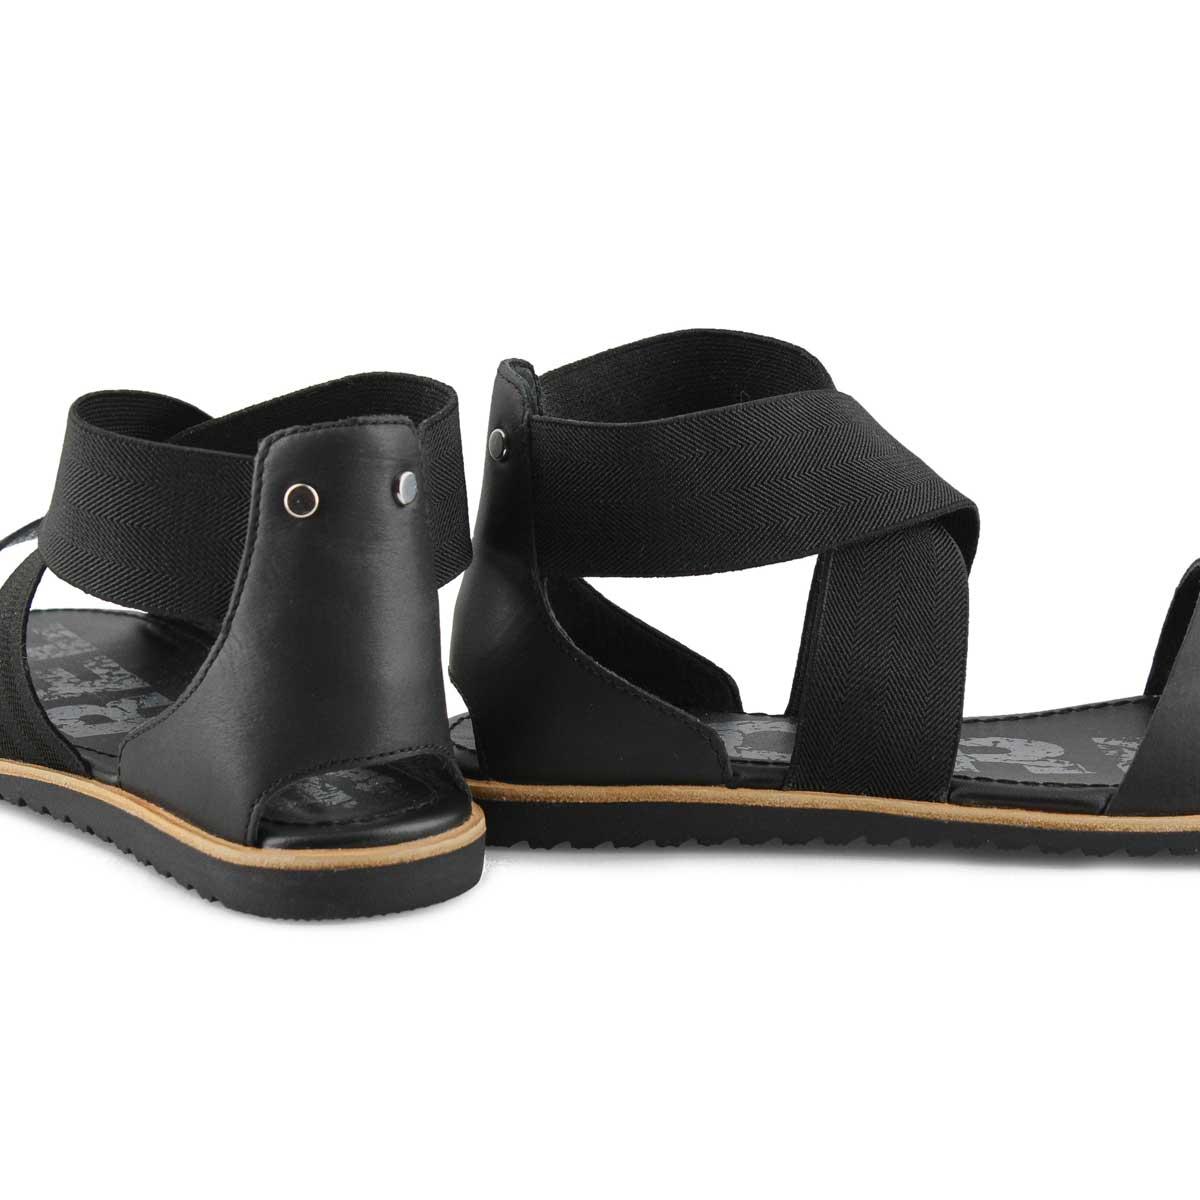 Lds Ella black casual sandal